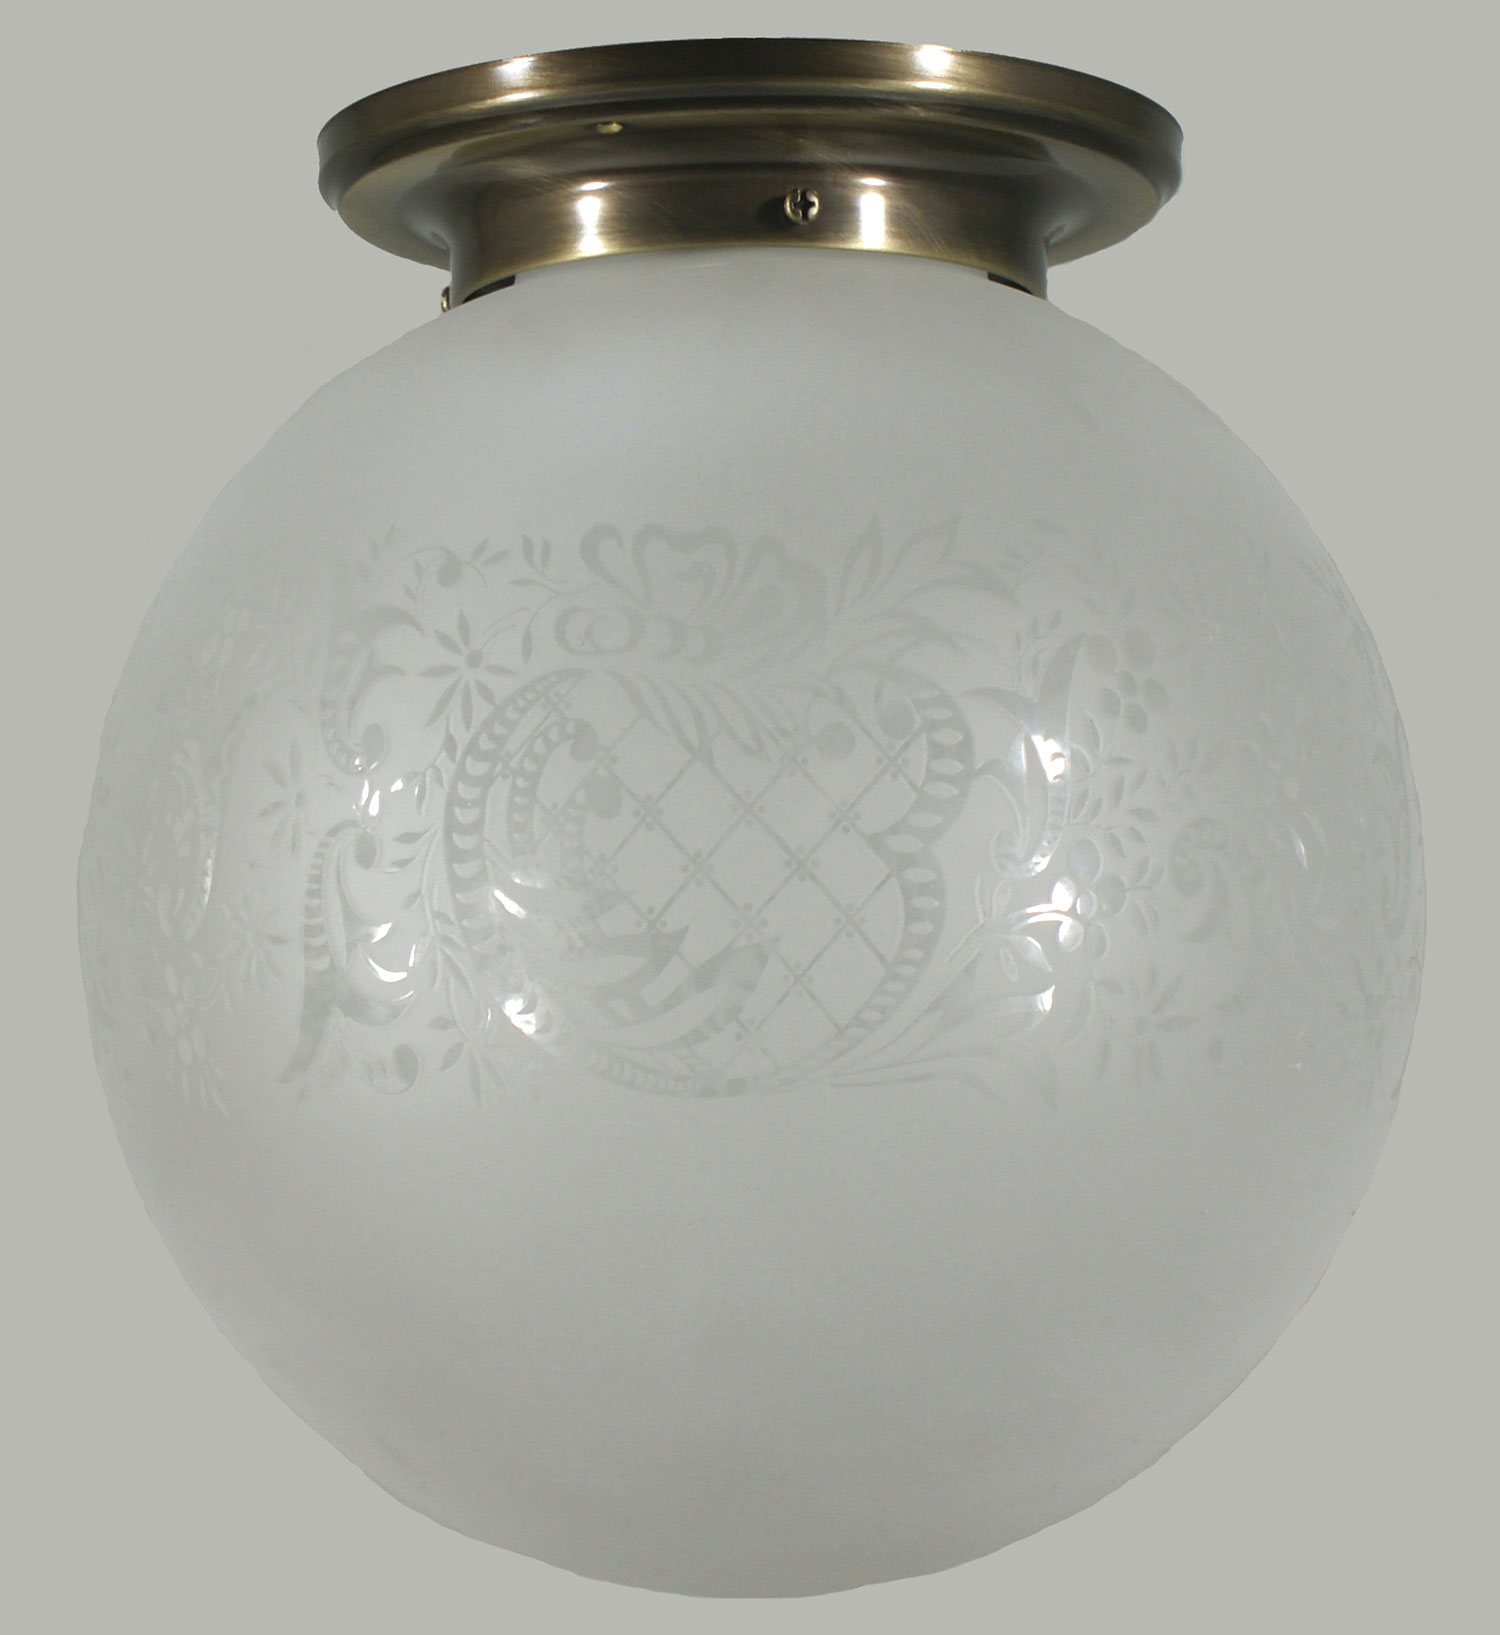 Zanui Ceiling Lights : Batten fix ceiling lights nouveau diy